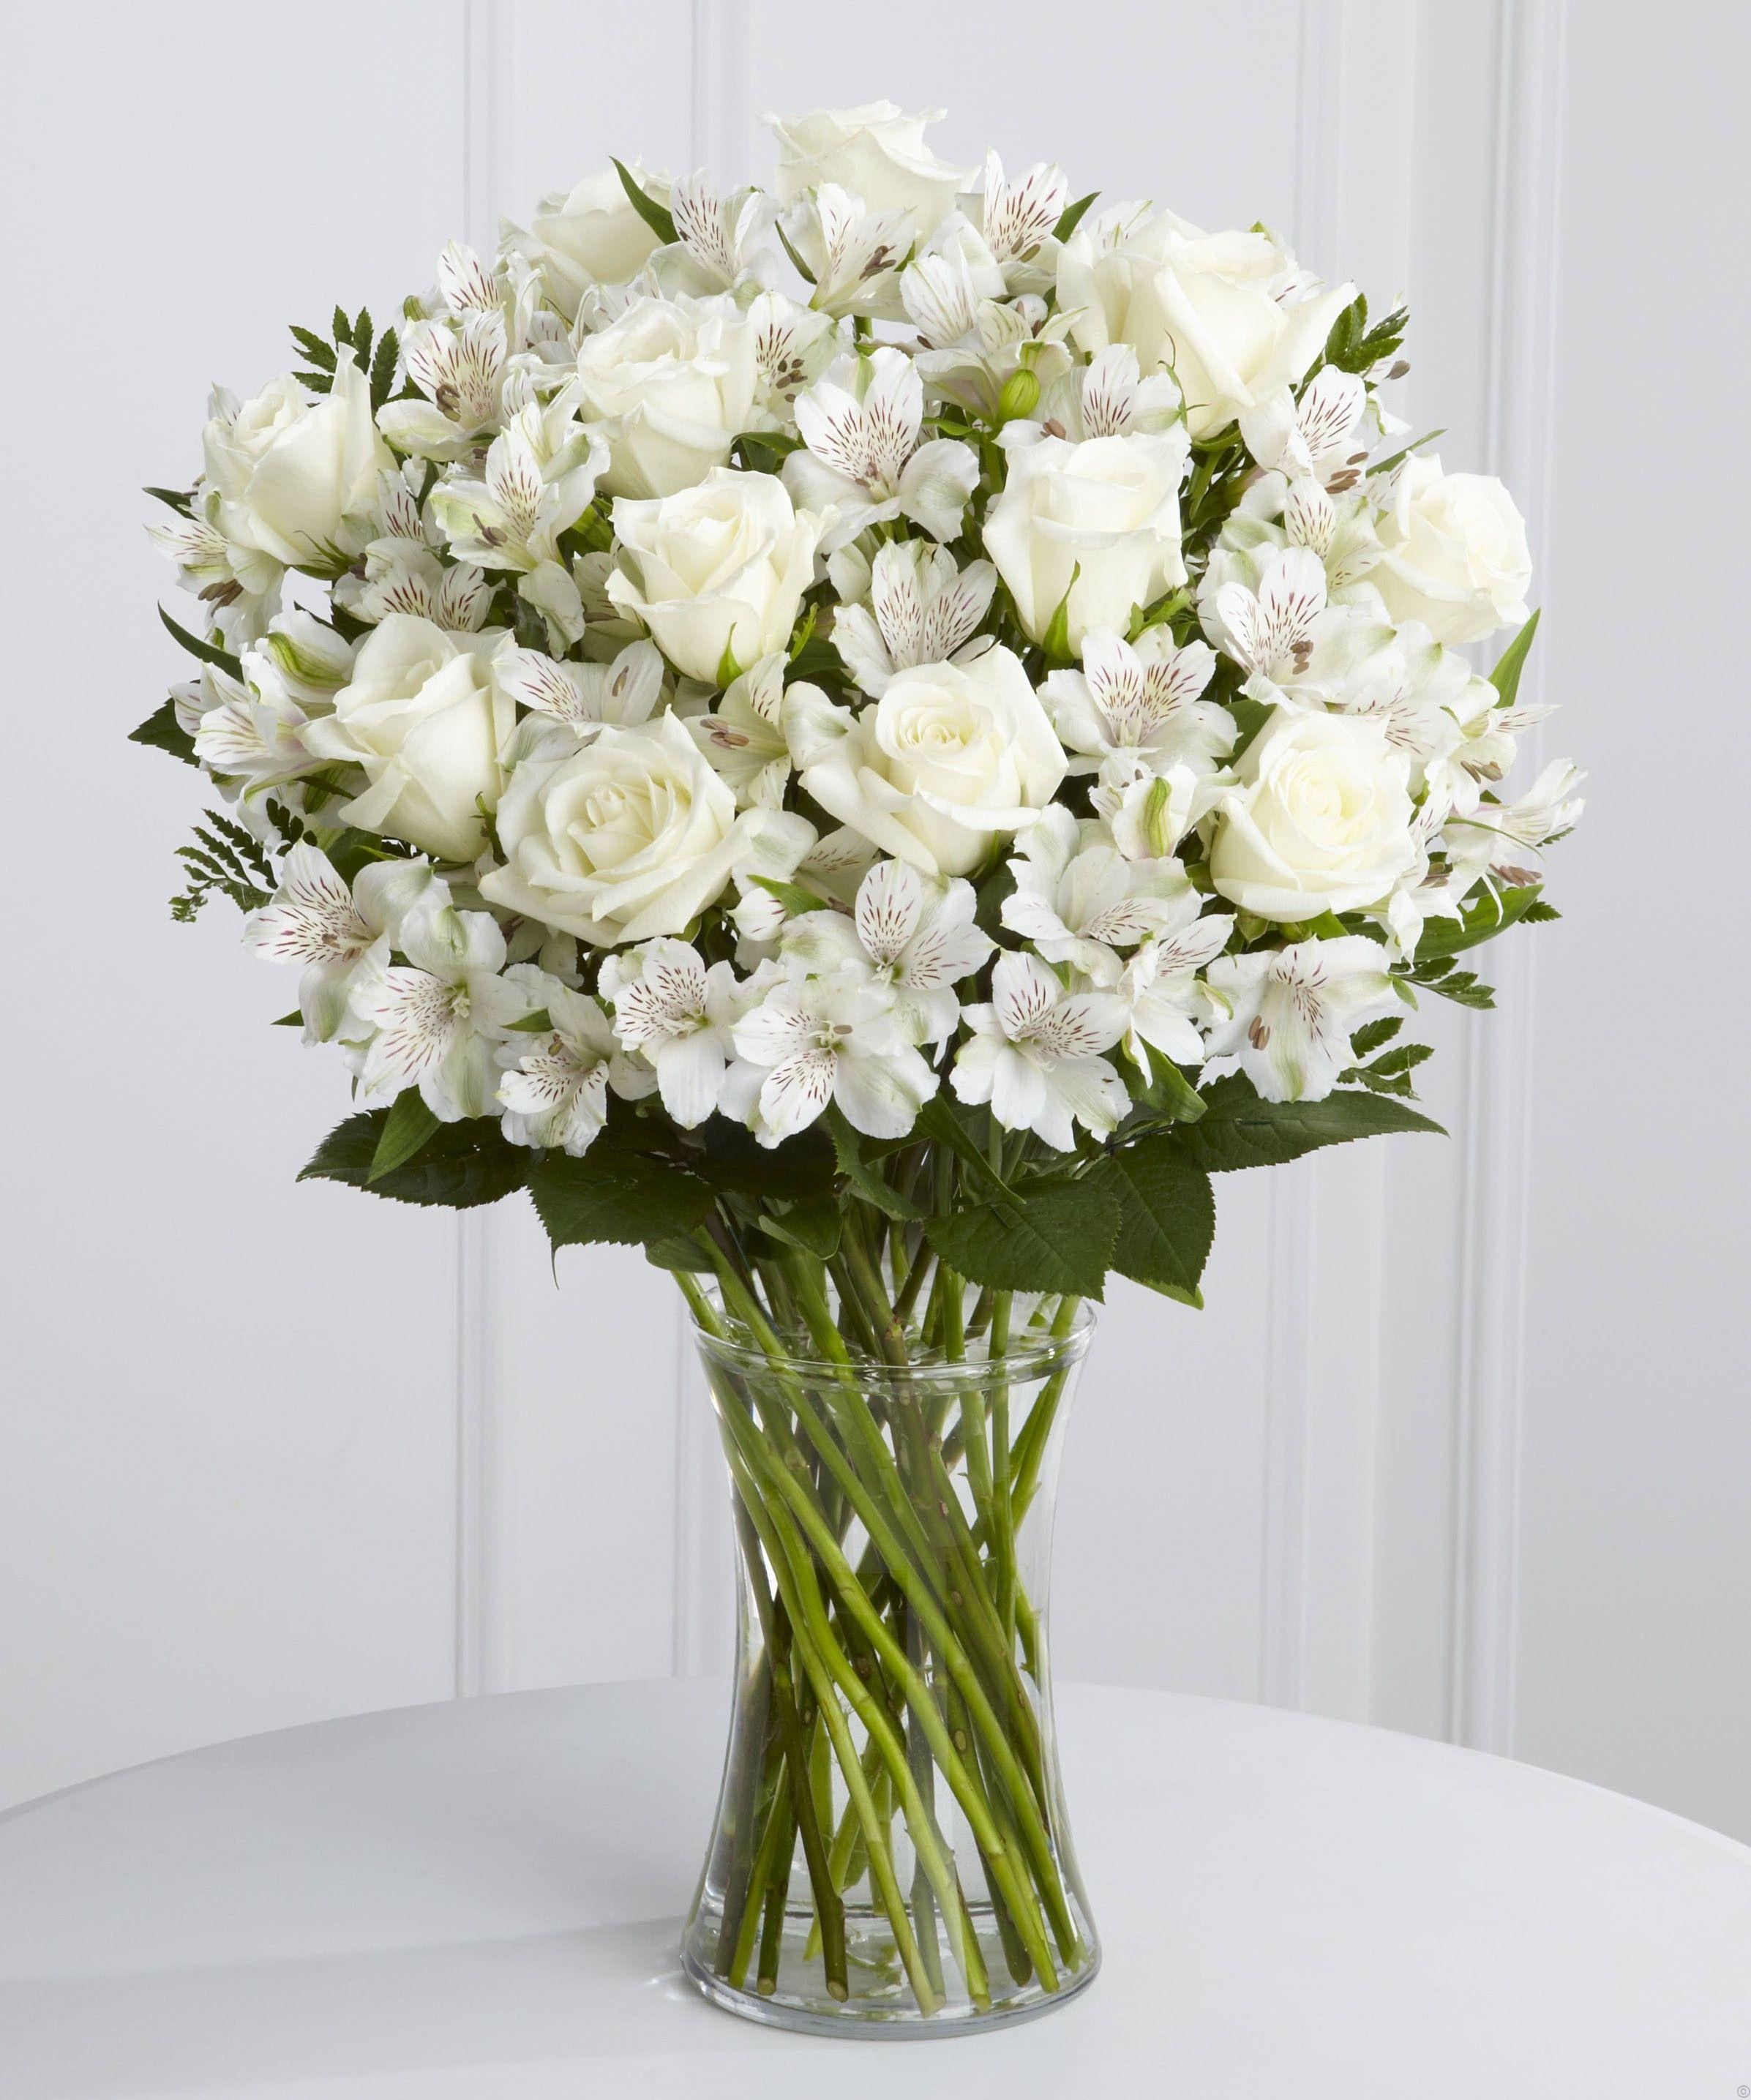 White Rose and Alstroemeria Vase Funeral flower